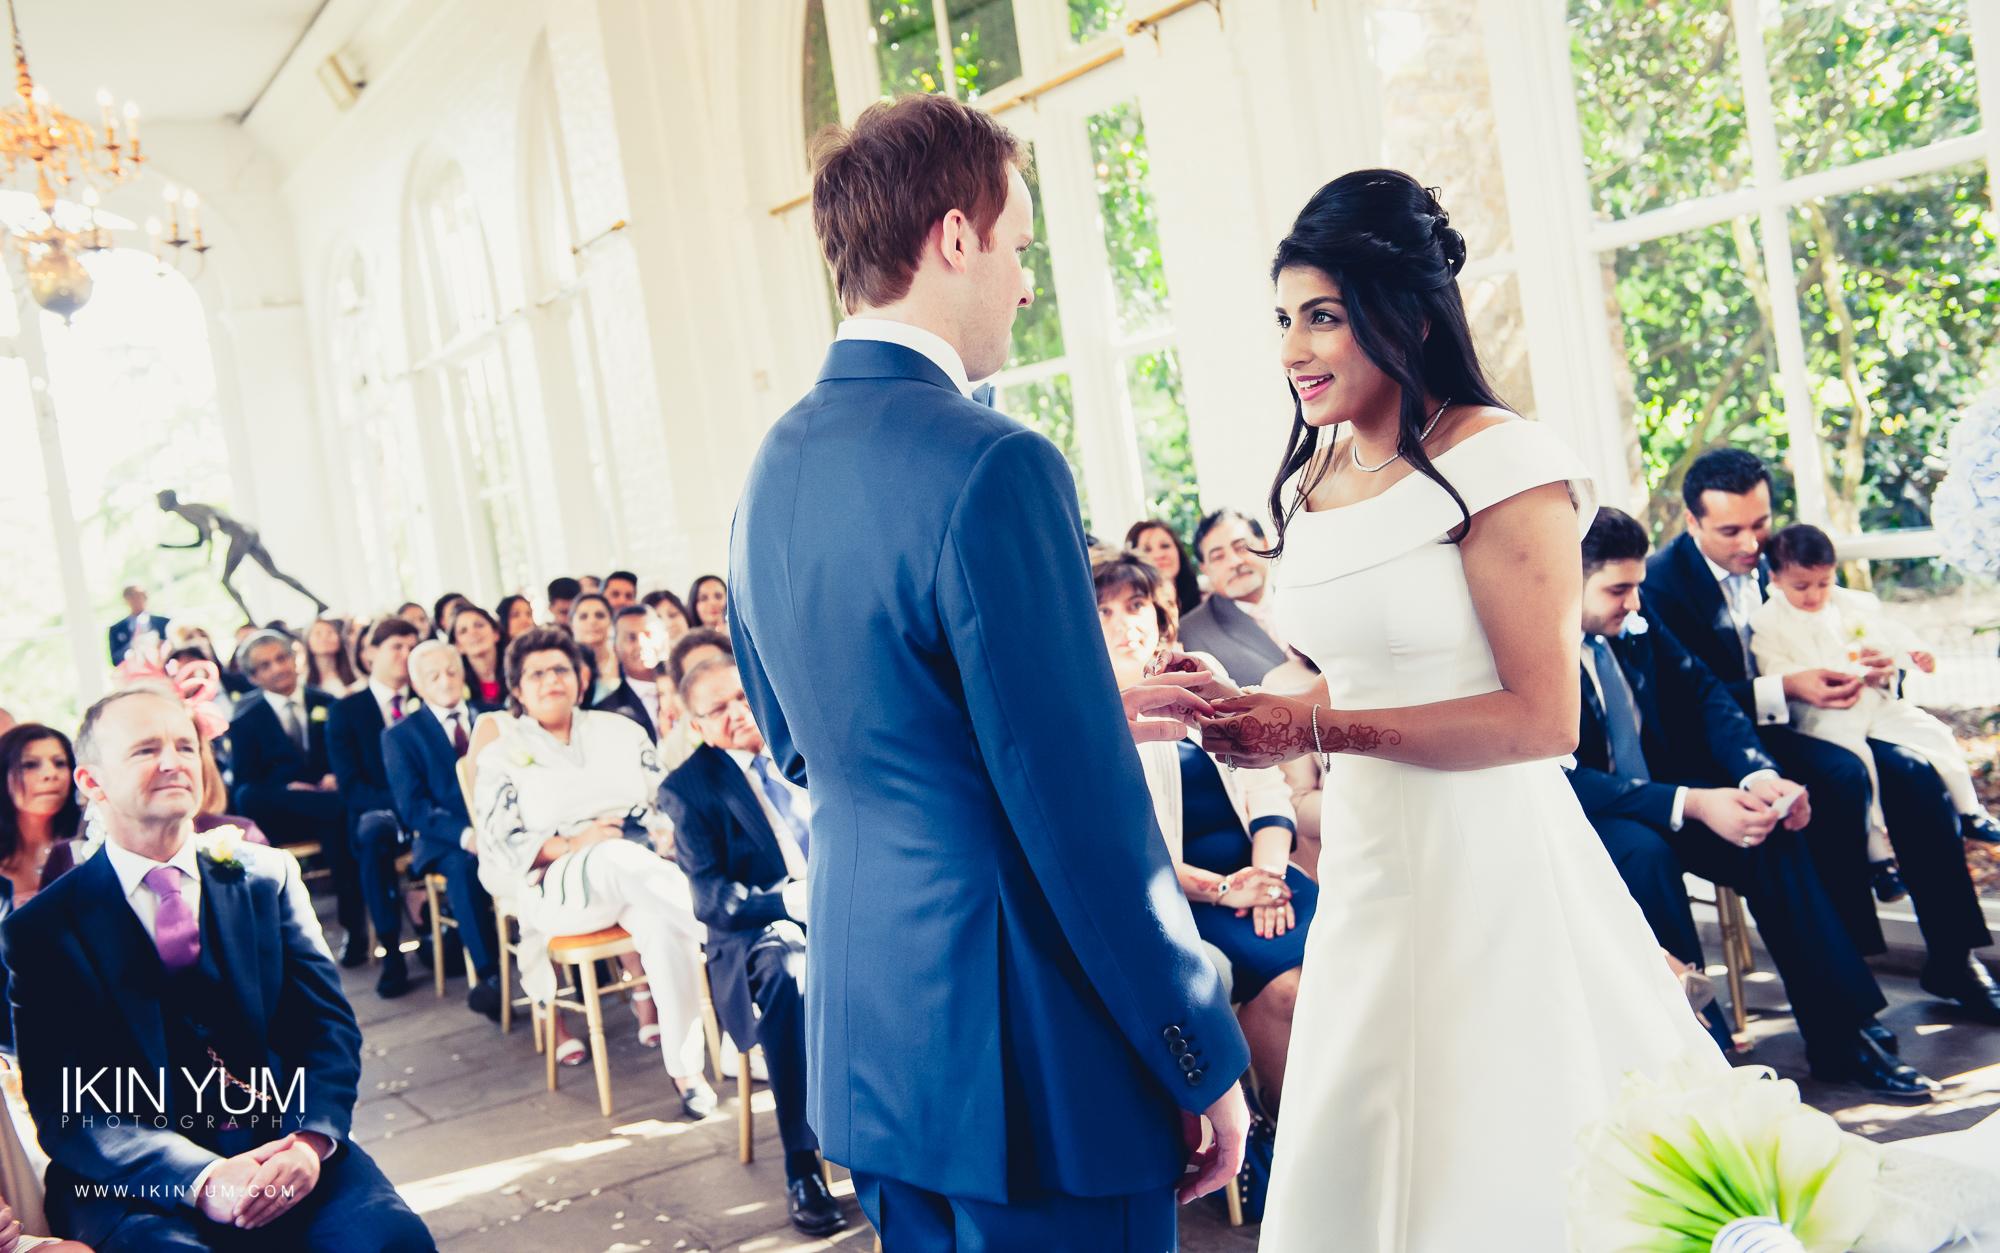 Holland Park Wedding - Ikin Yum Photography-0036.jpg